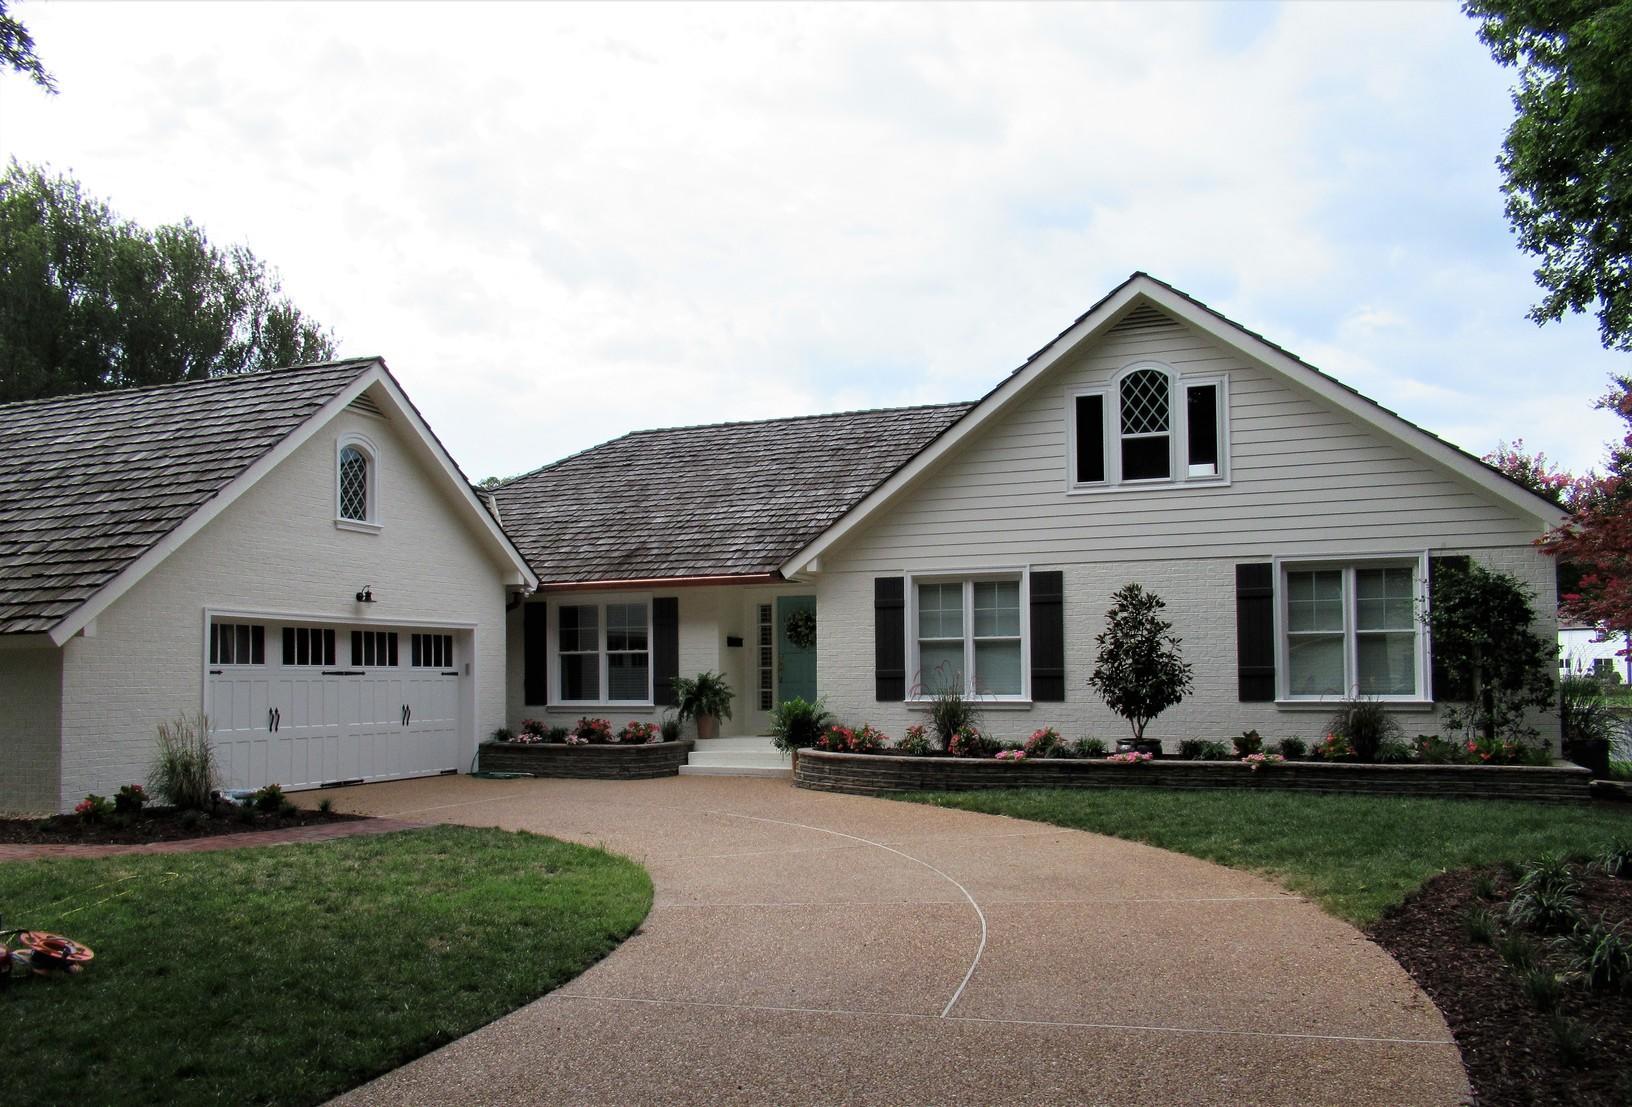 Hampton, Virginia Waterfront Home featured in Beachfront Bargainhunt - After Photo